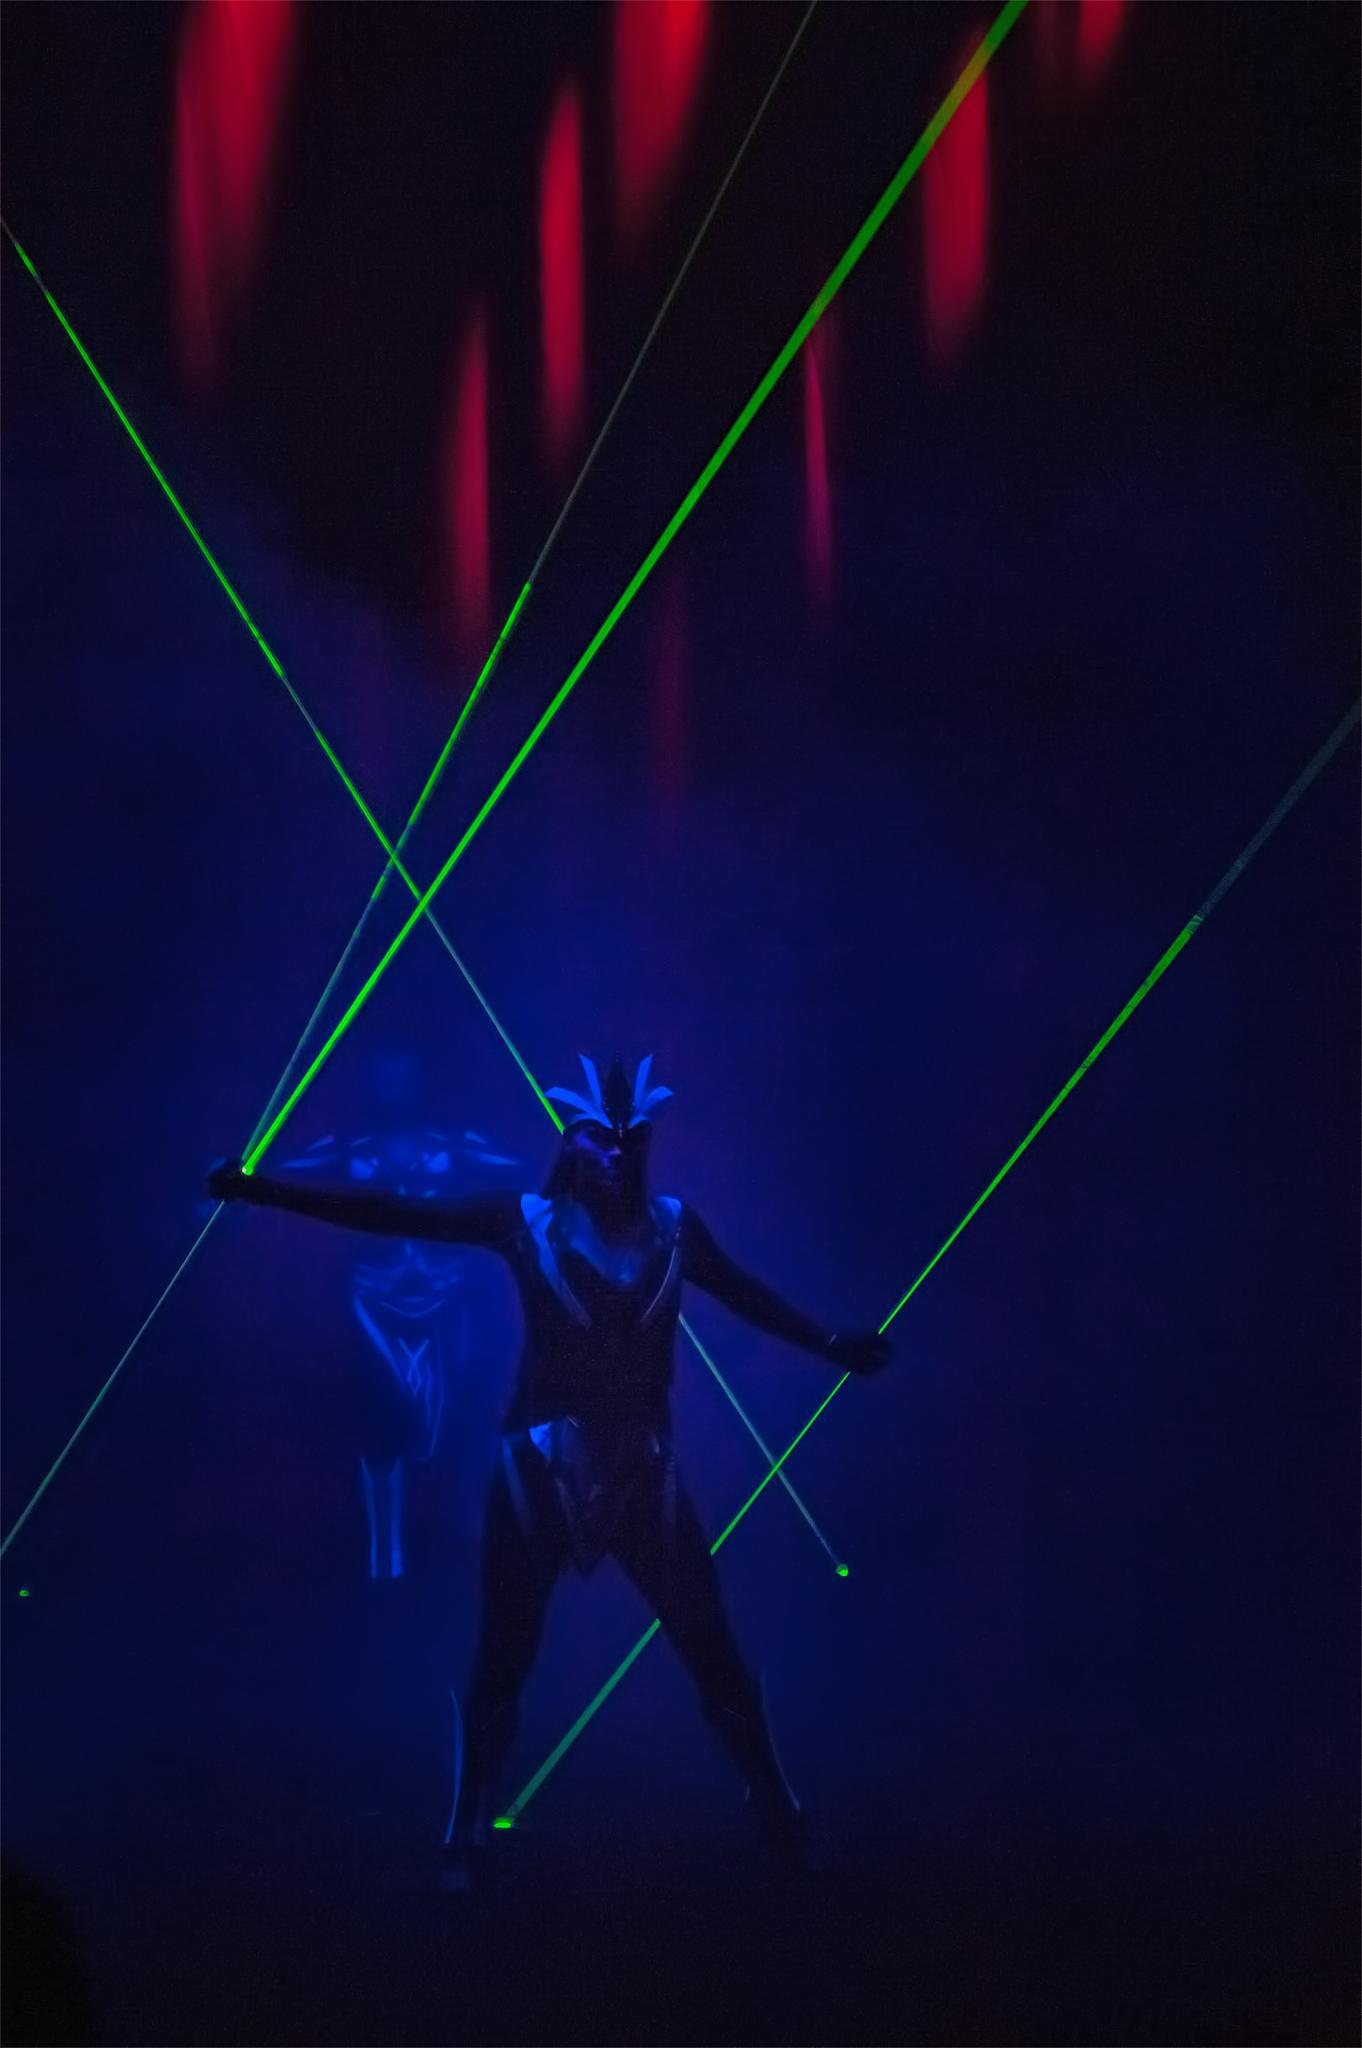 Laser by kaulpeter